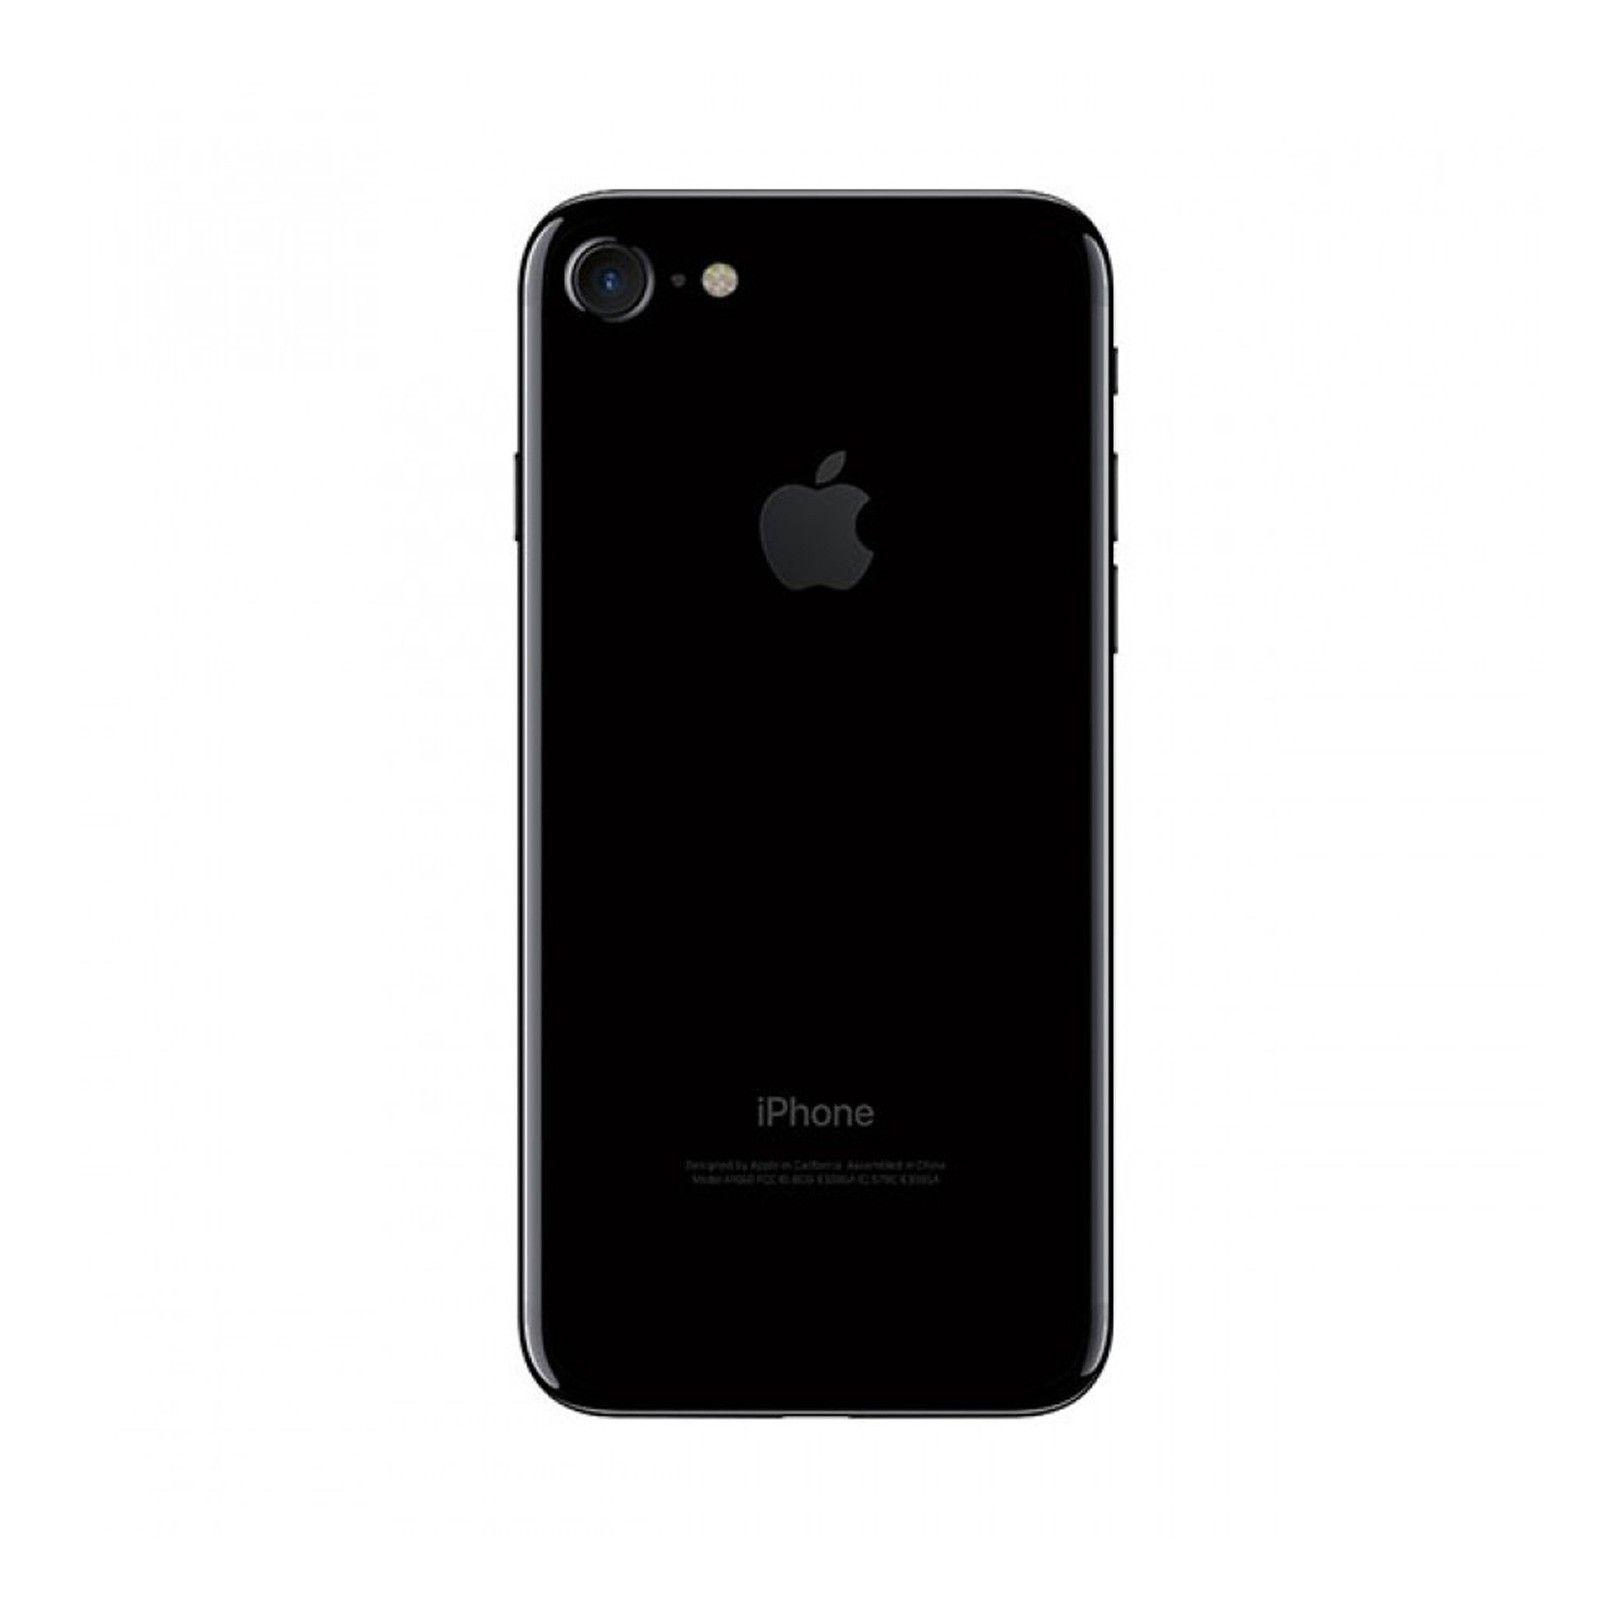 iphone 7 black 32gb цена